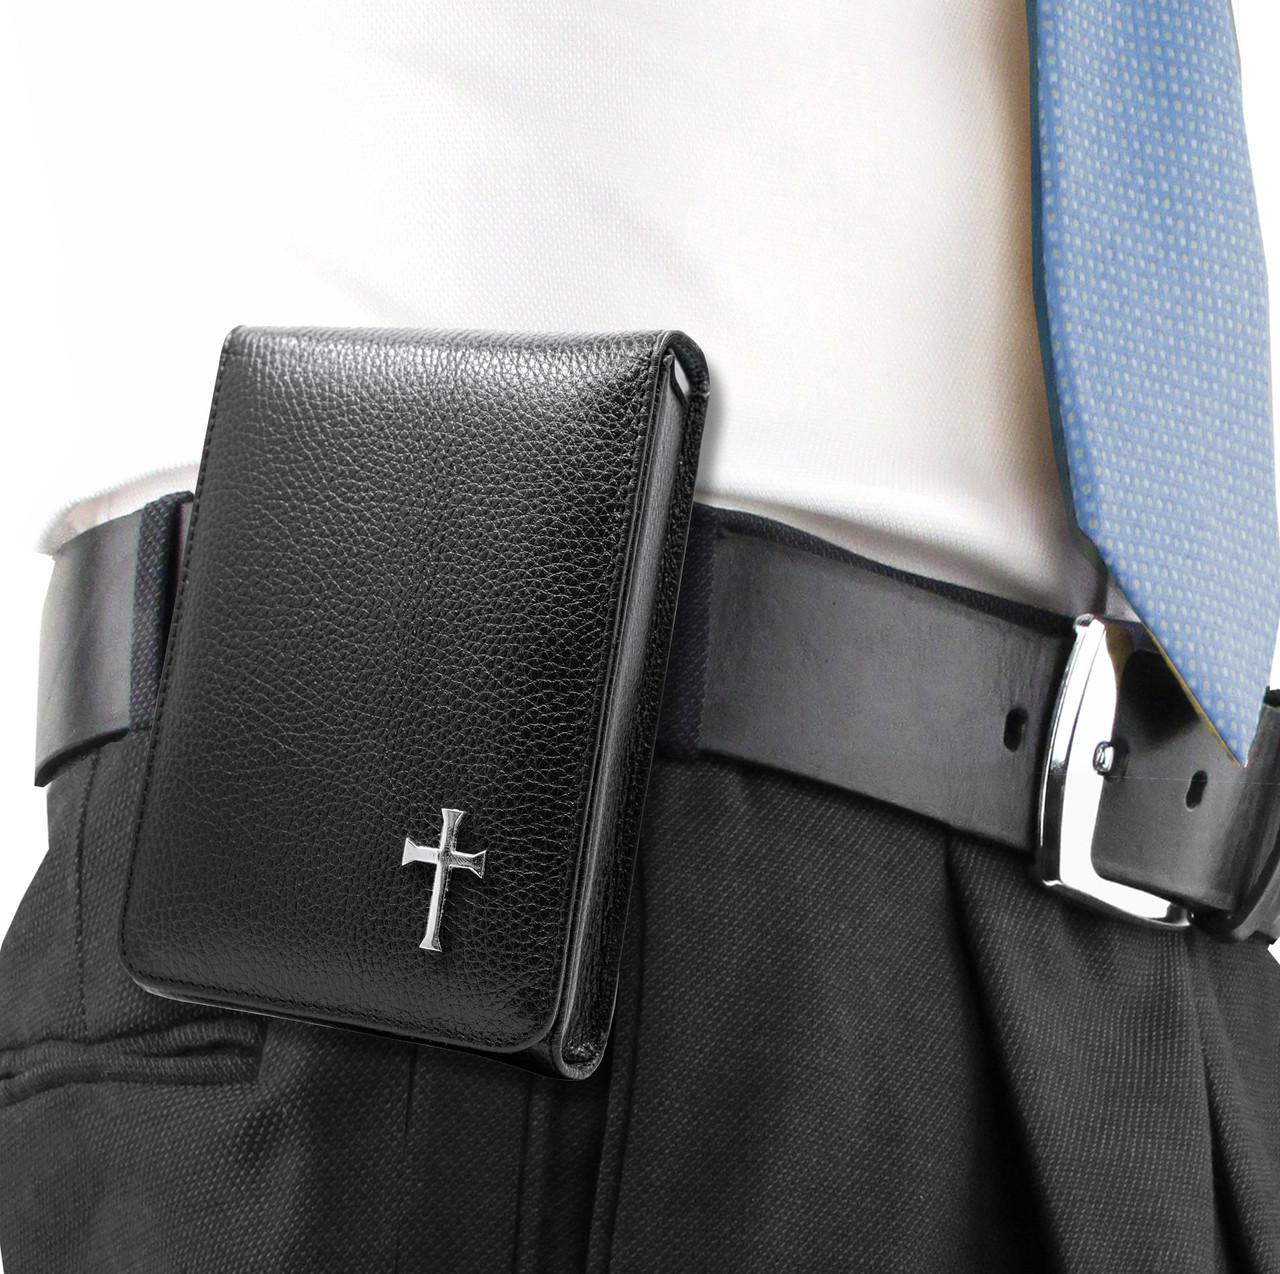 Glock 48 Black Leather Cross Series Holster